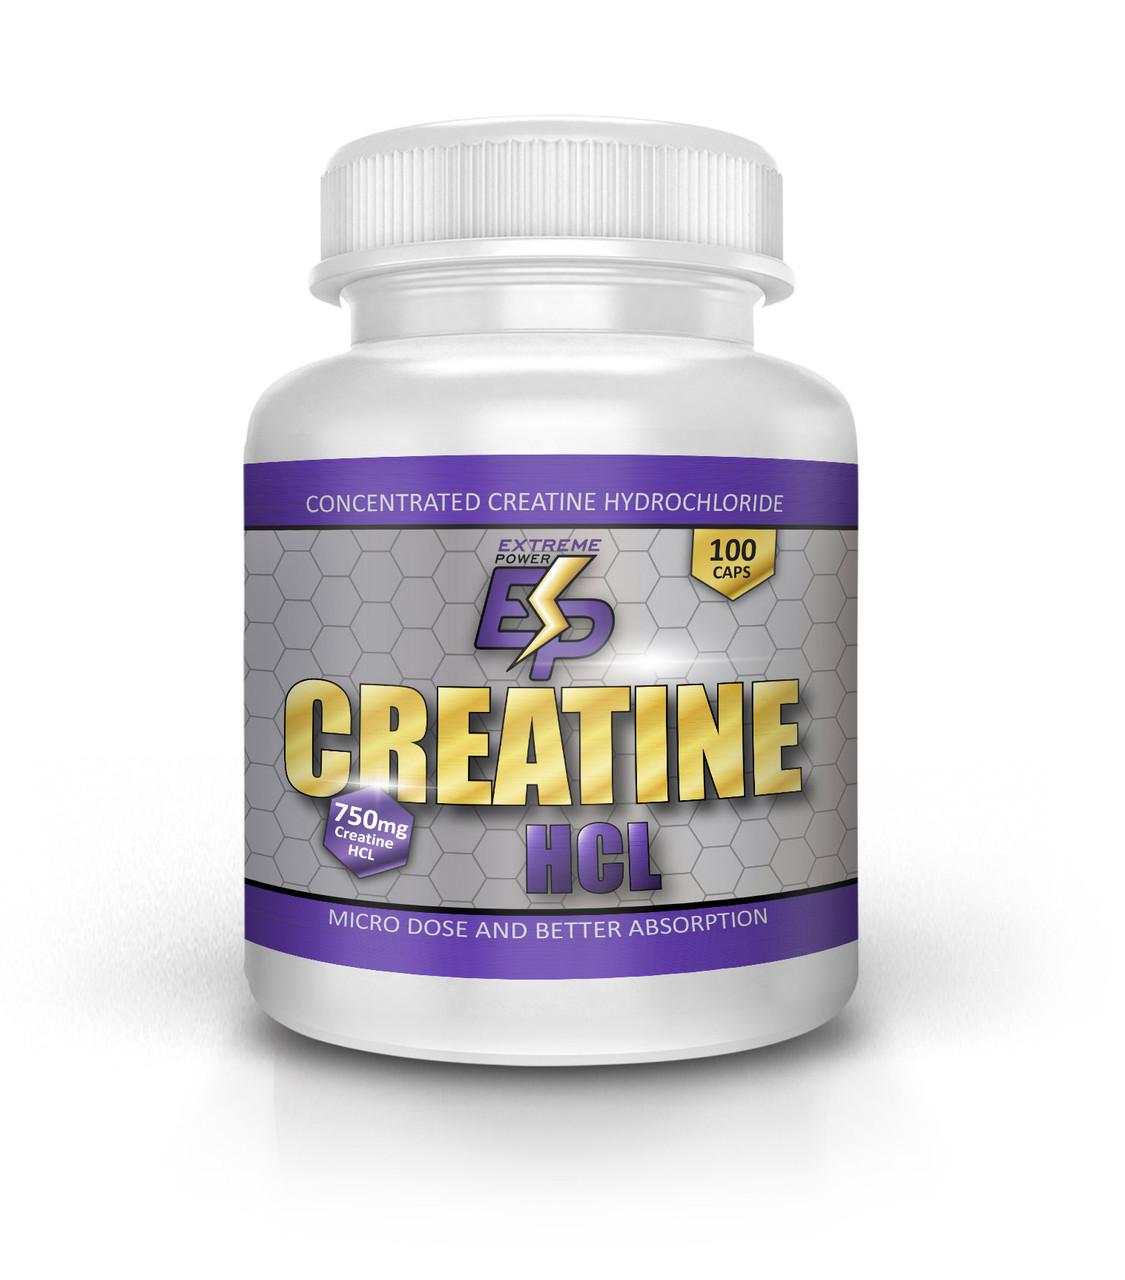 Creatine hcl dose